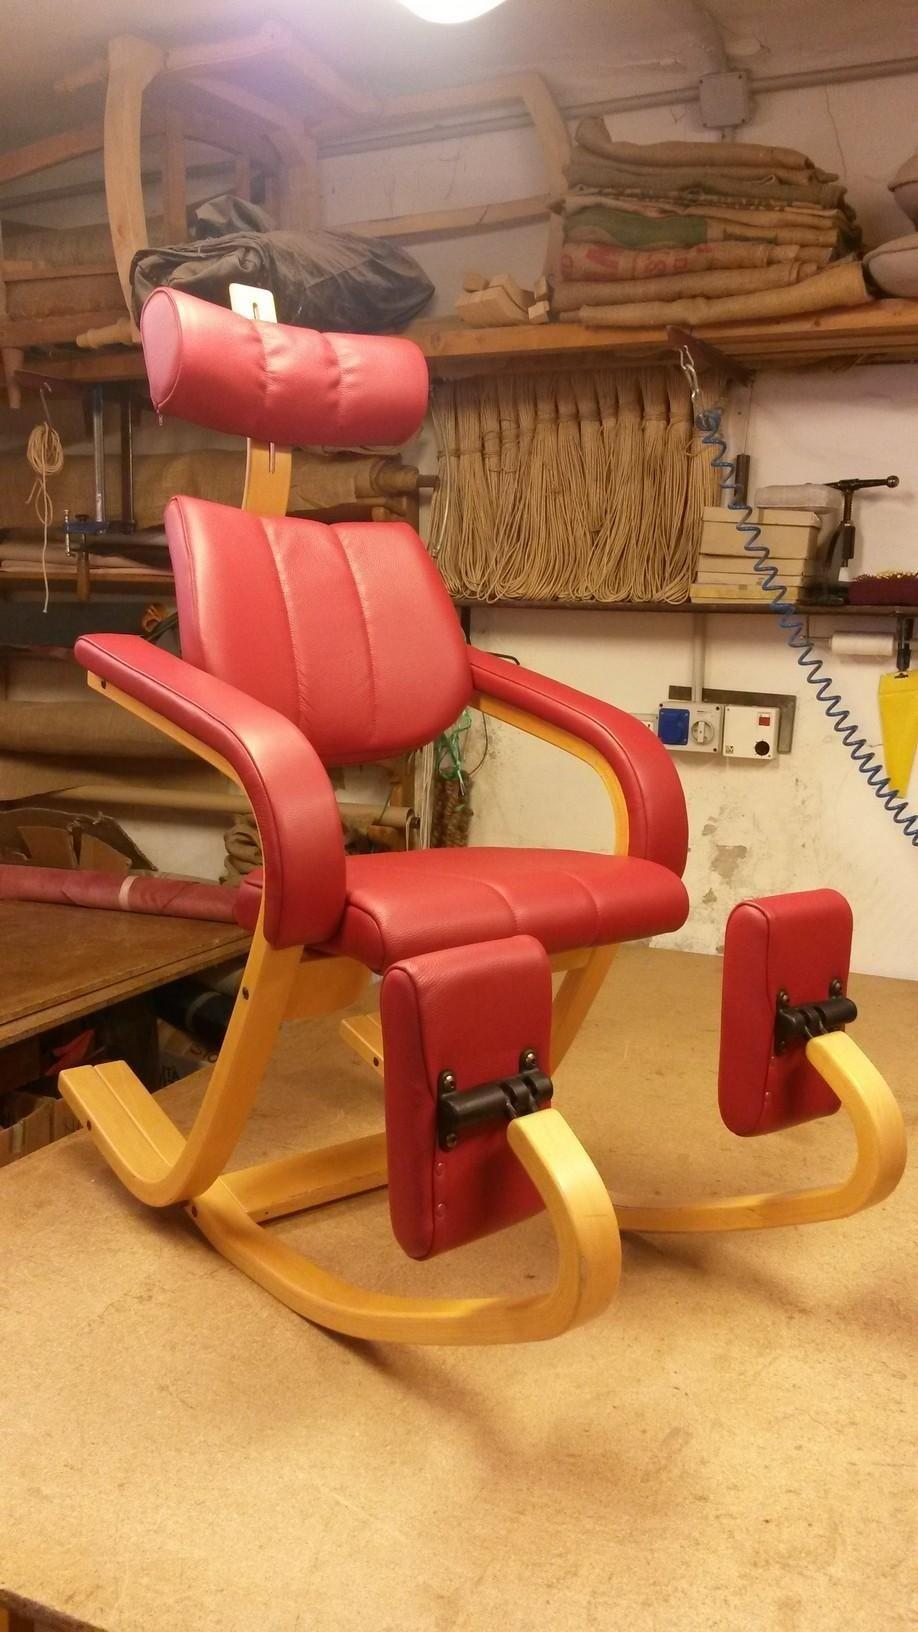 ergonomic stokke armchair.jpeg